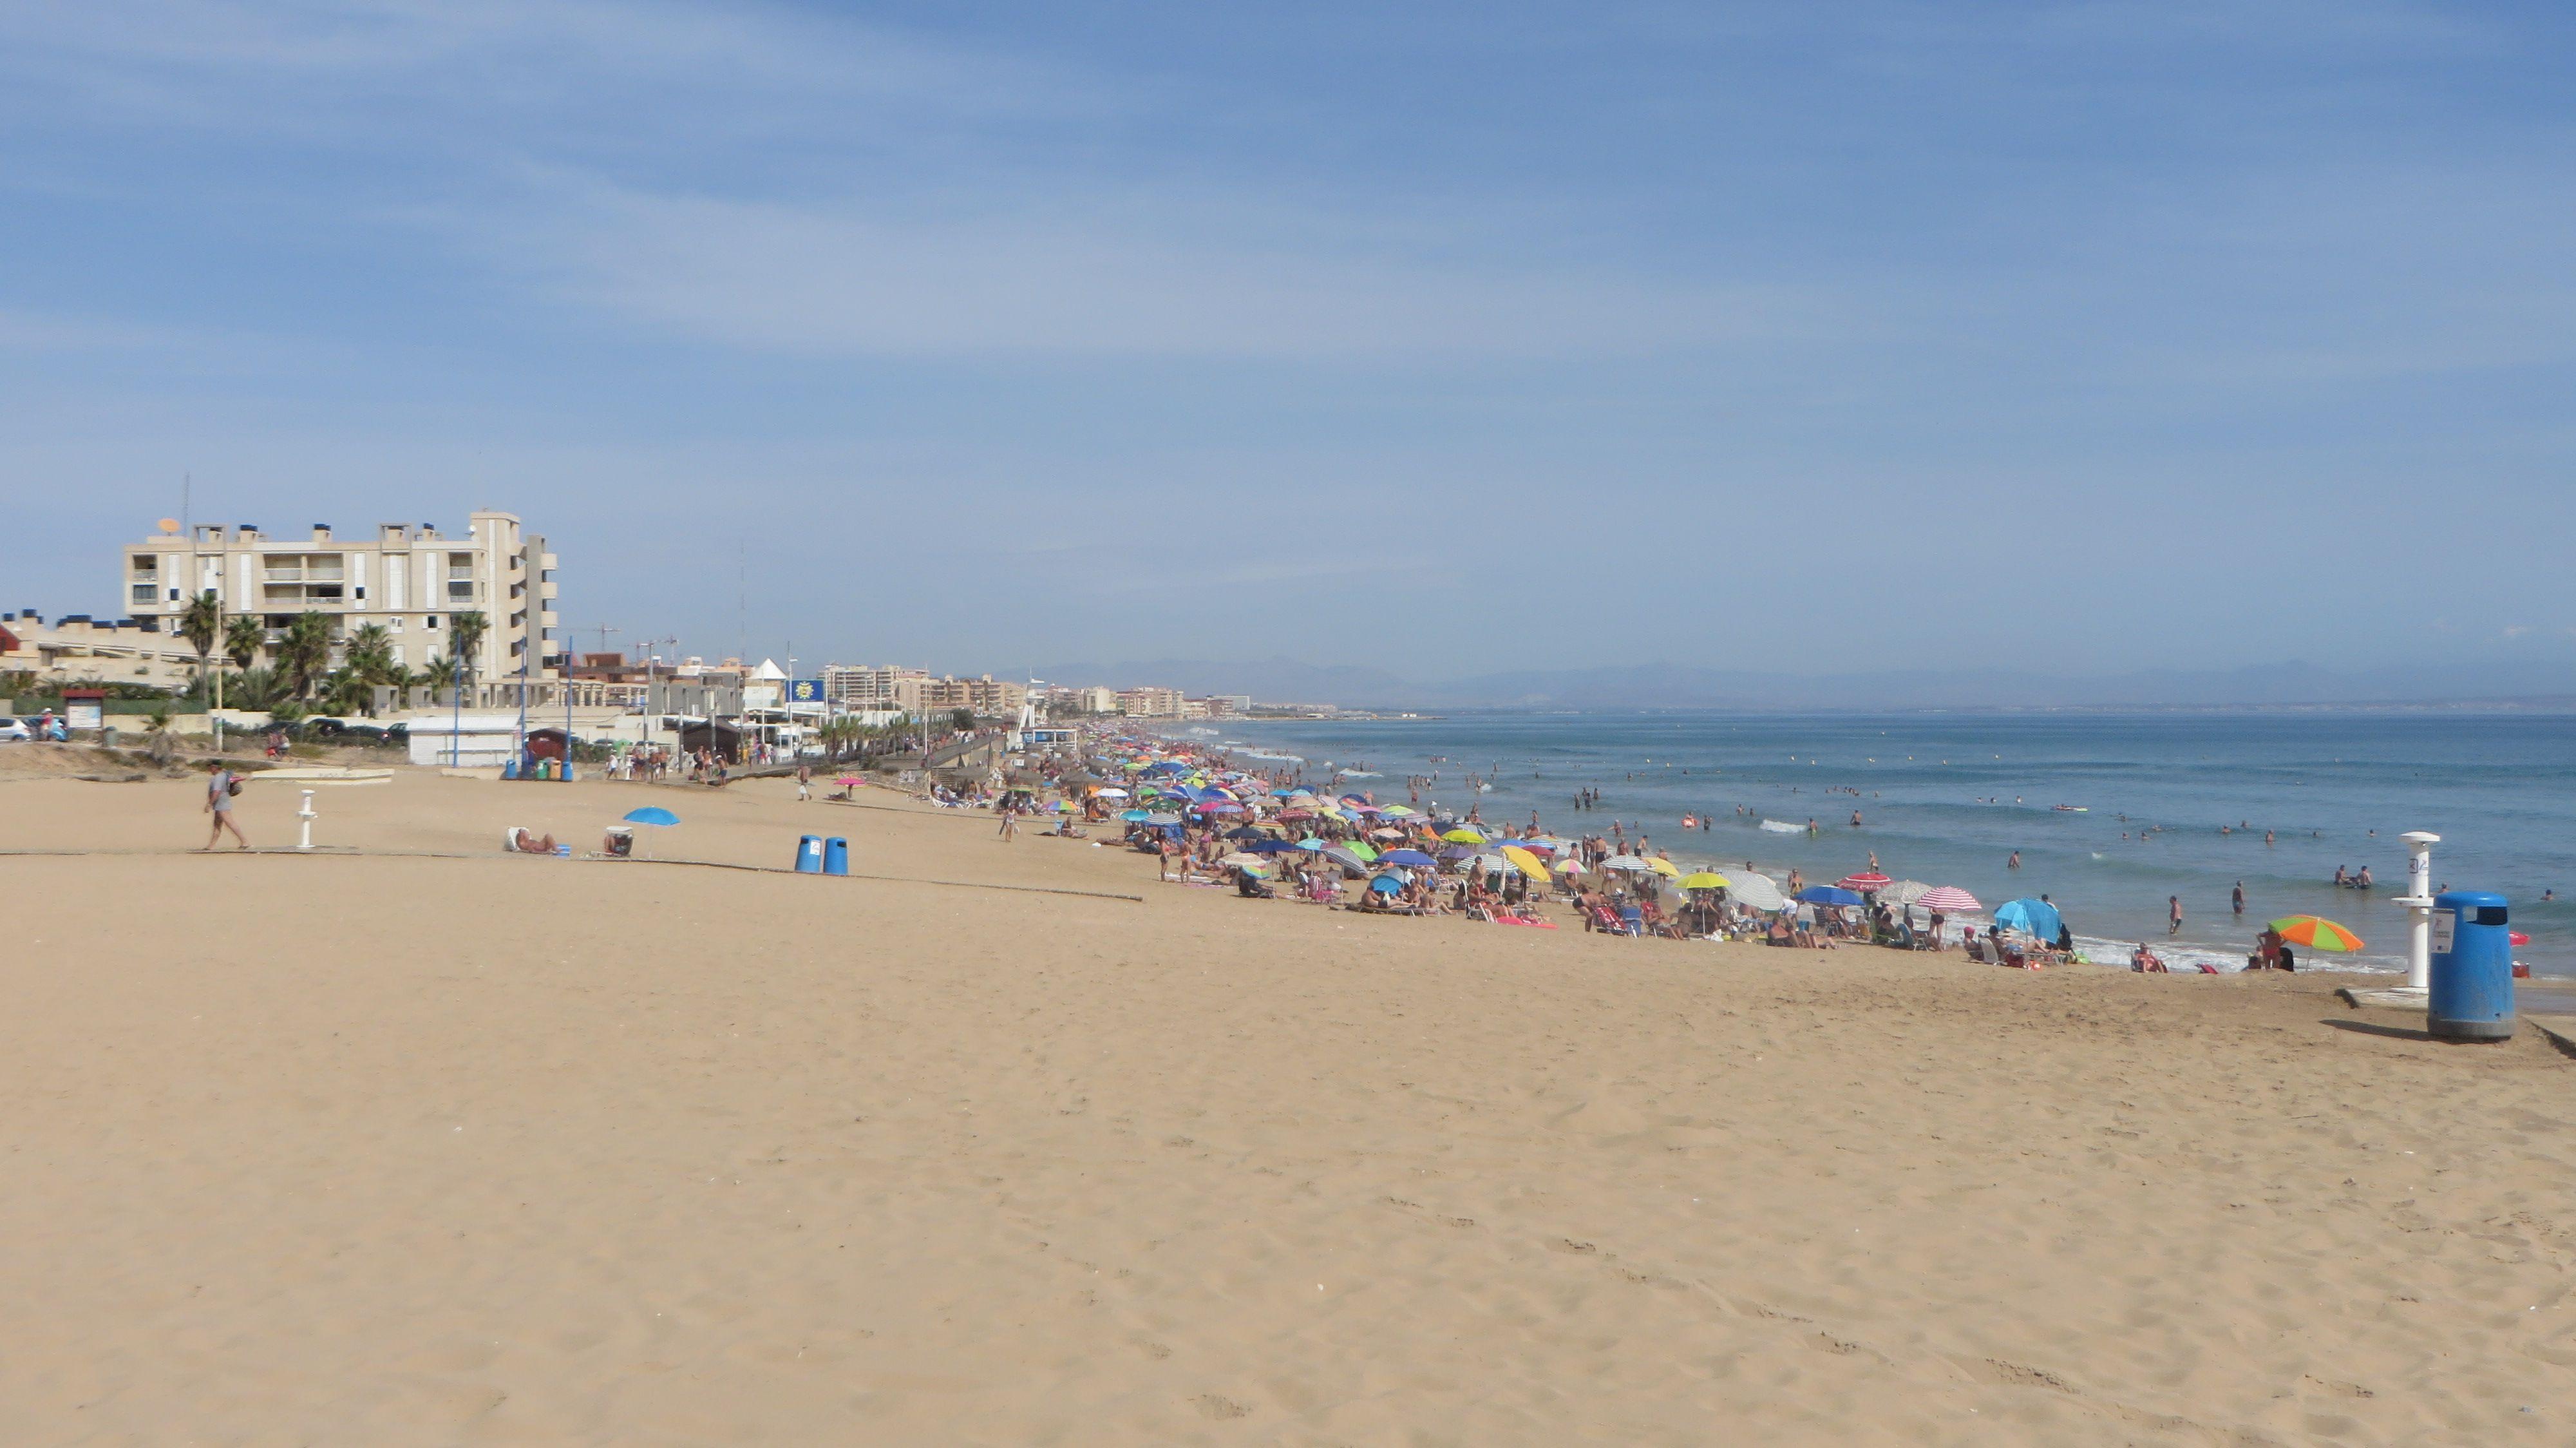 The Sand Dunes Of La Mata Beach